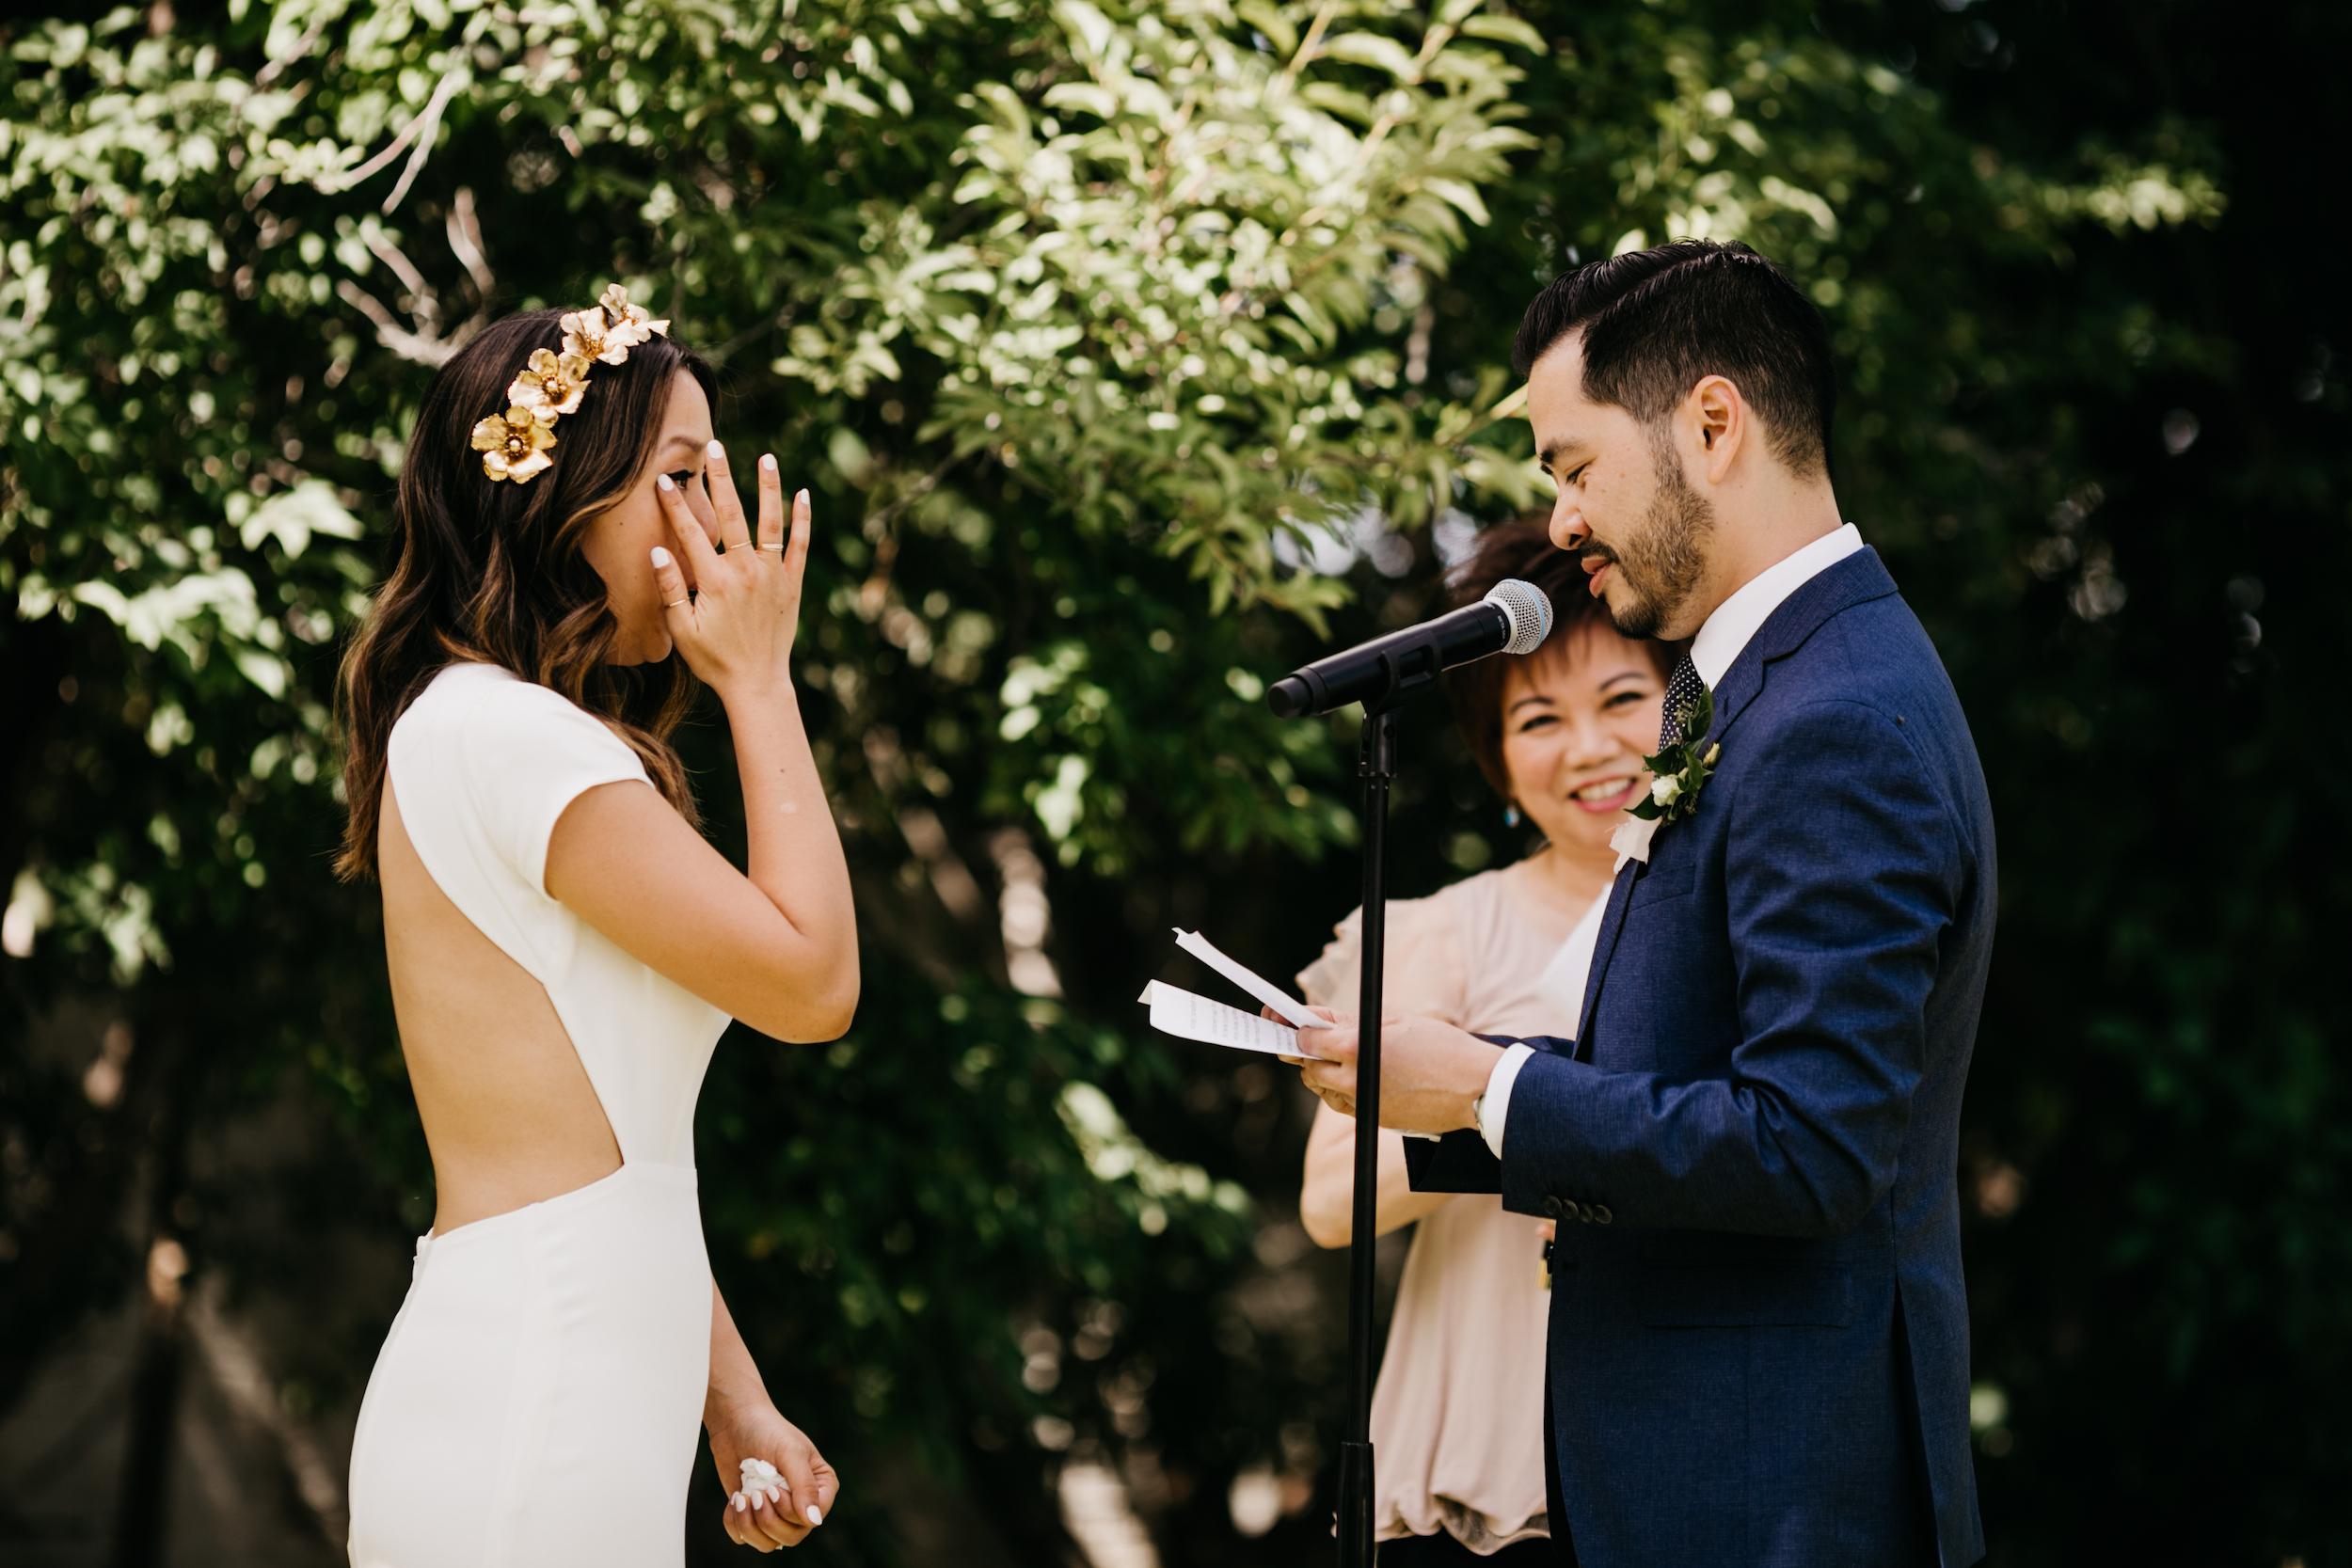 palm-springs-wedding-photography450.jpg